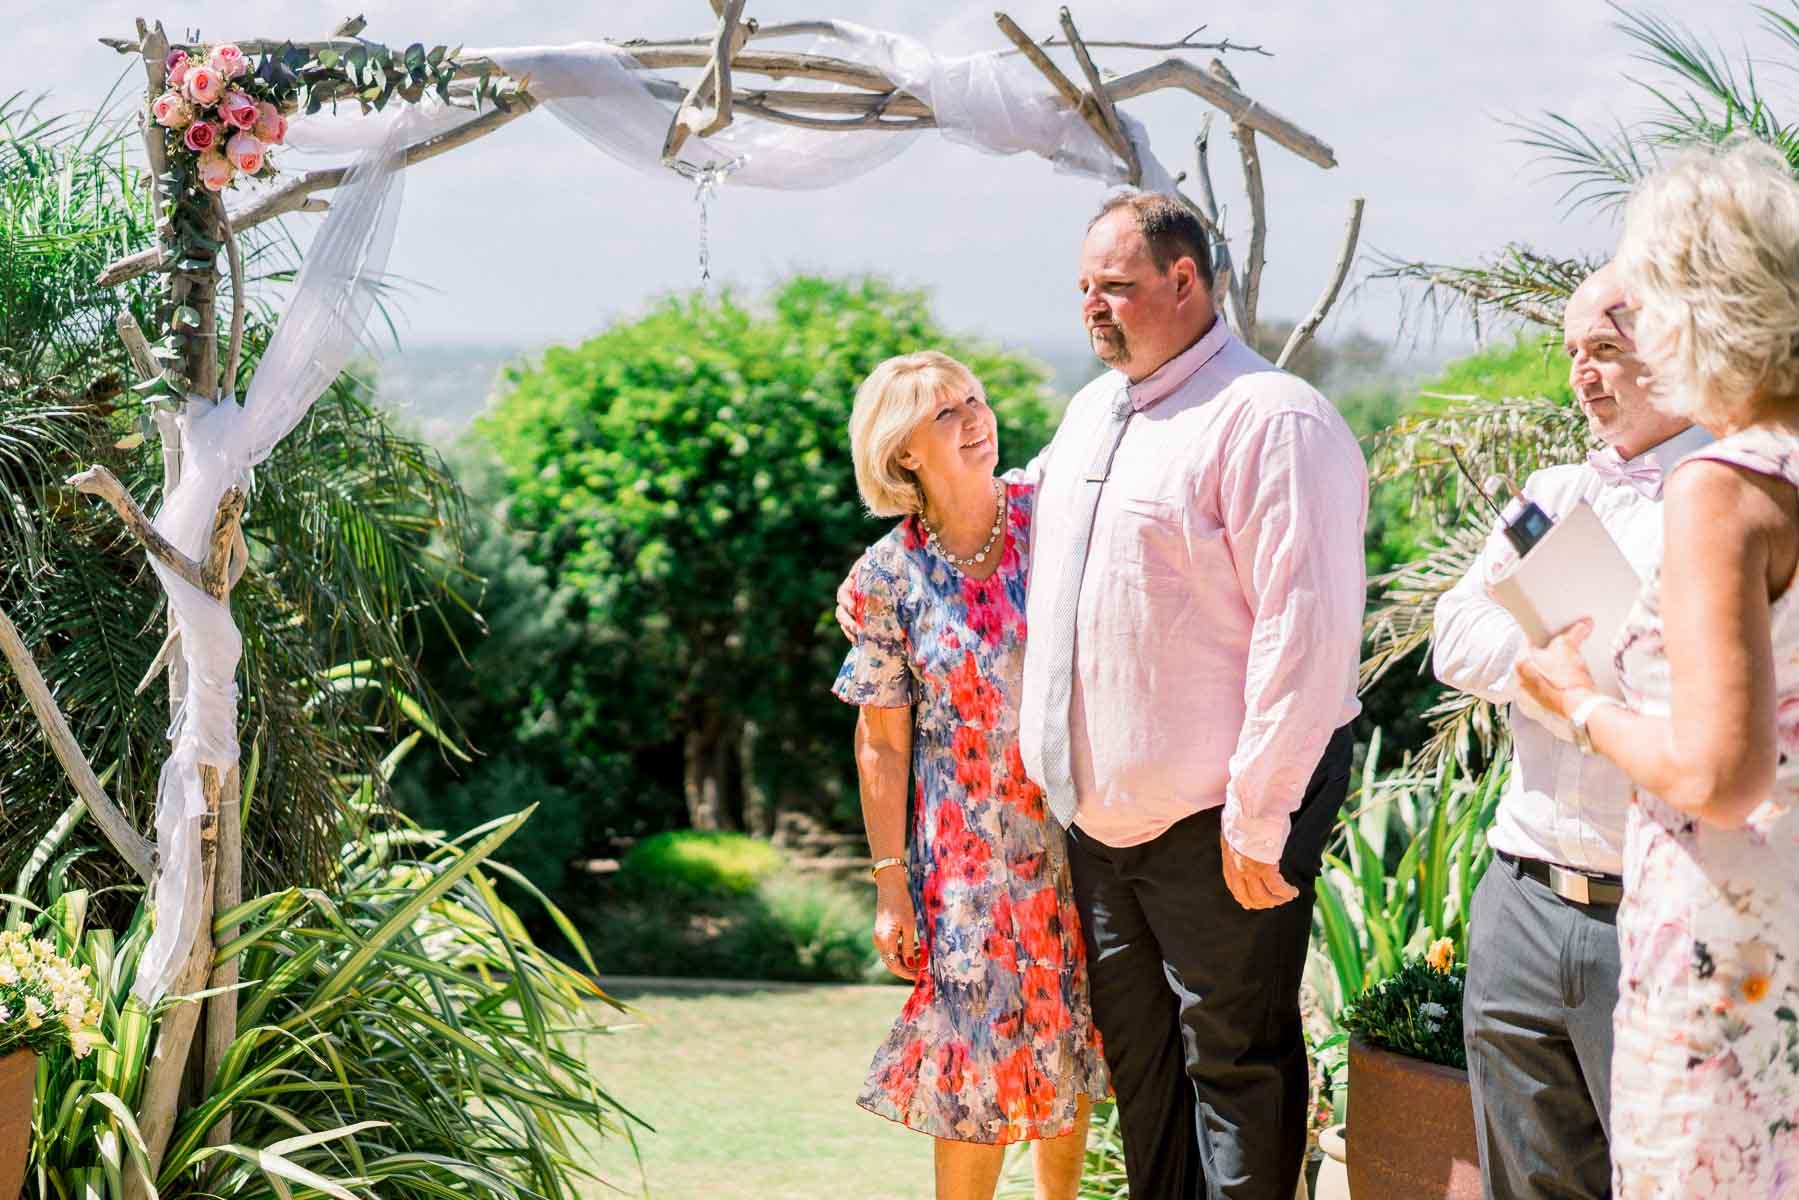 mt-eliza-mornington-peninsula-backyard-wedding-heart+soul-weddings-allison-matt-03119.jpg